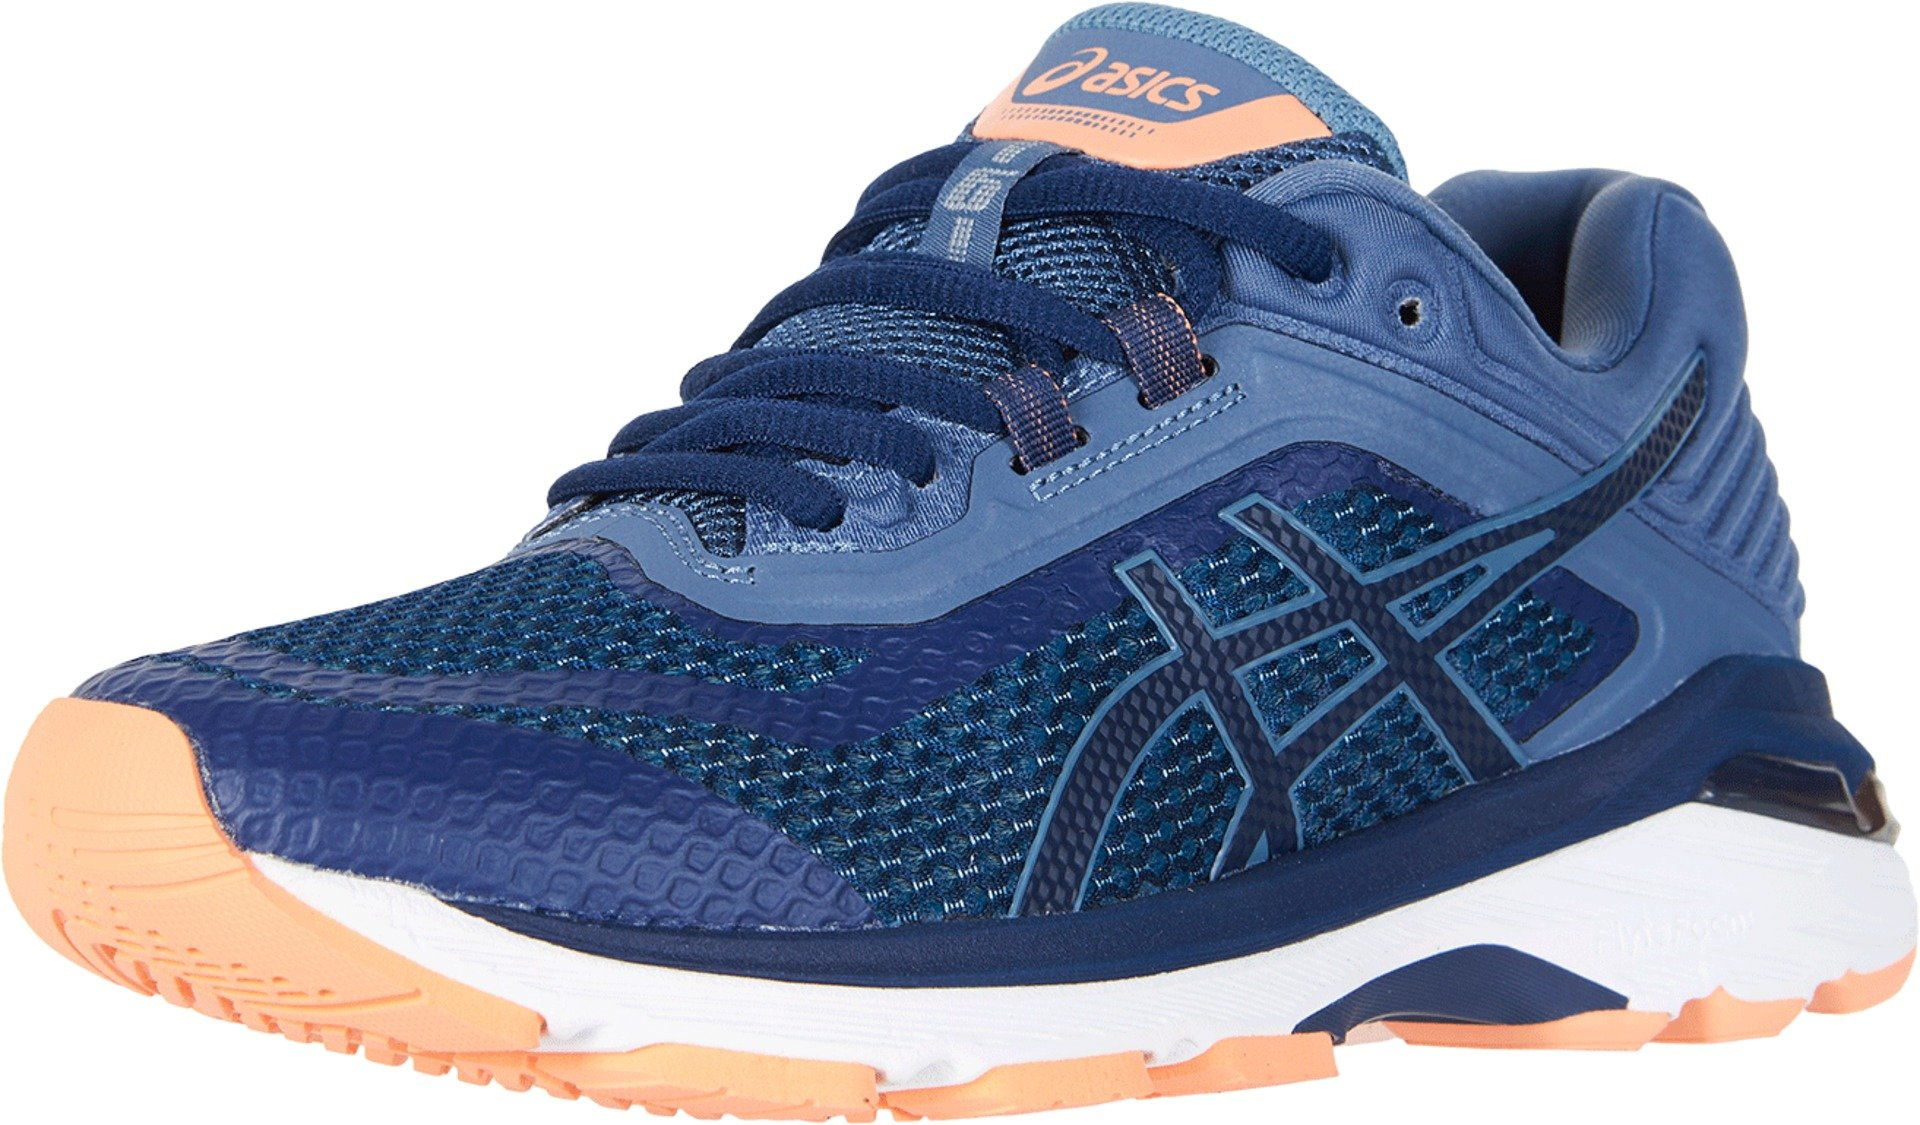 ASICS Women's GT-2000 6 Running Shoe, Indigo Blue/Indigo Blue/Smoke Blue, 5 XW US